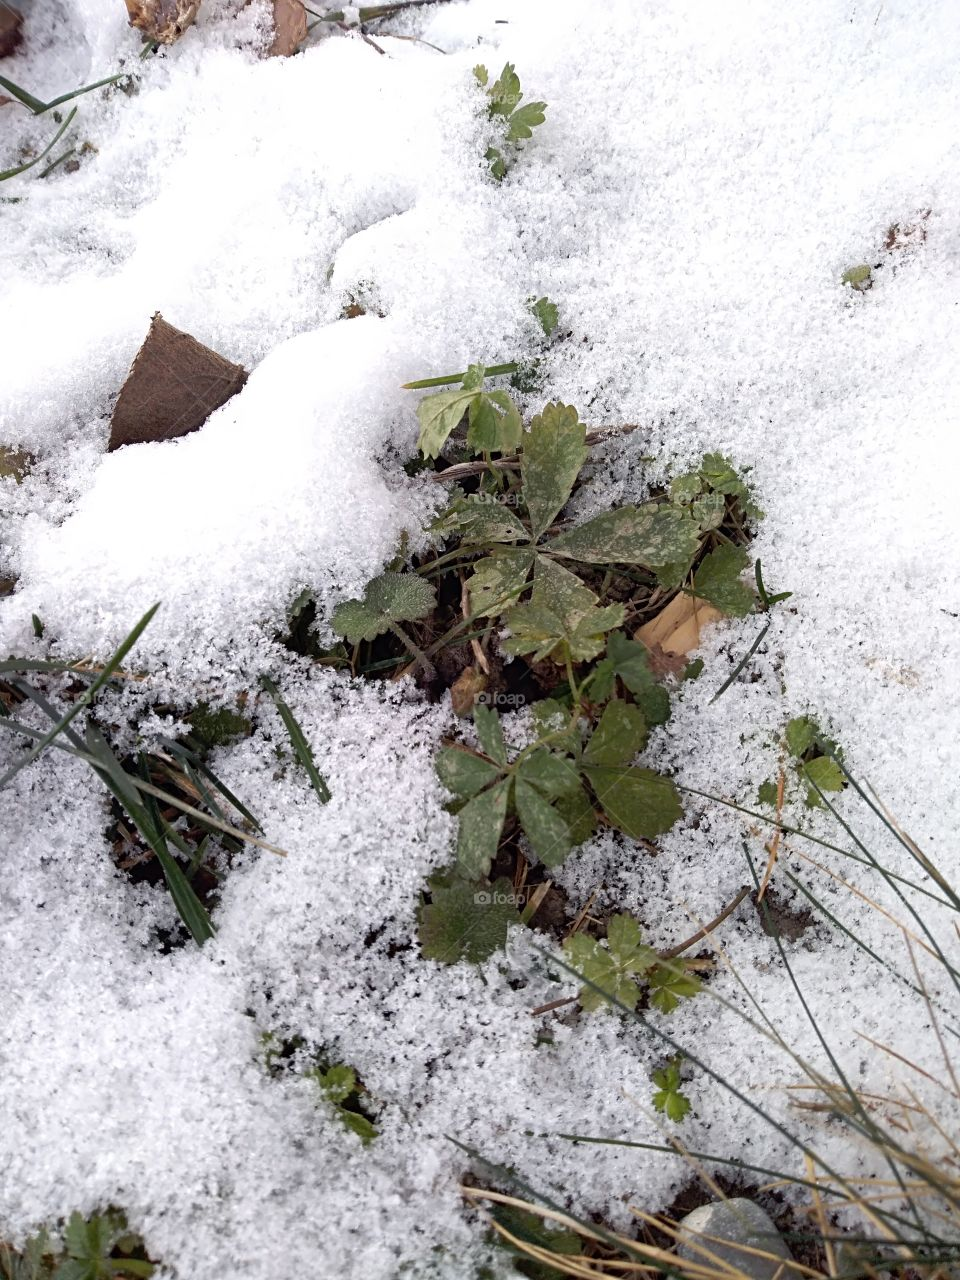 Green plant under snow